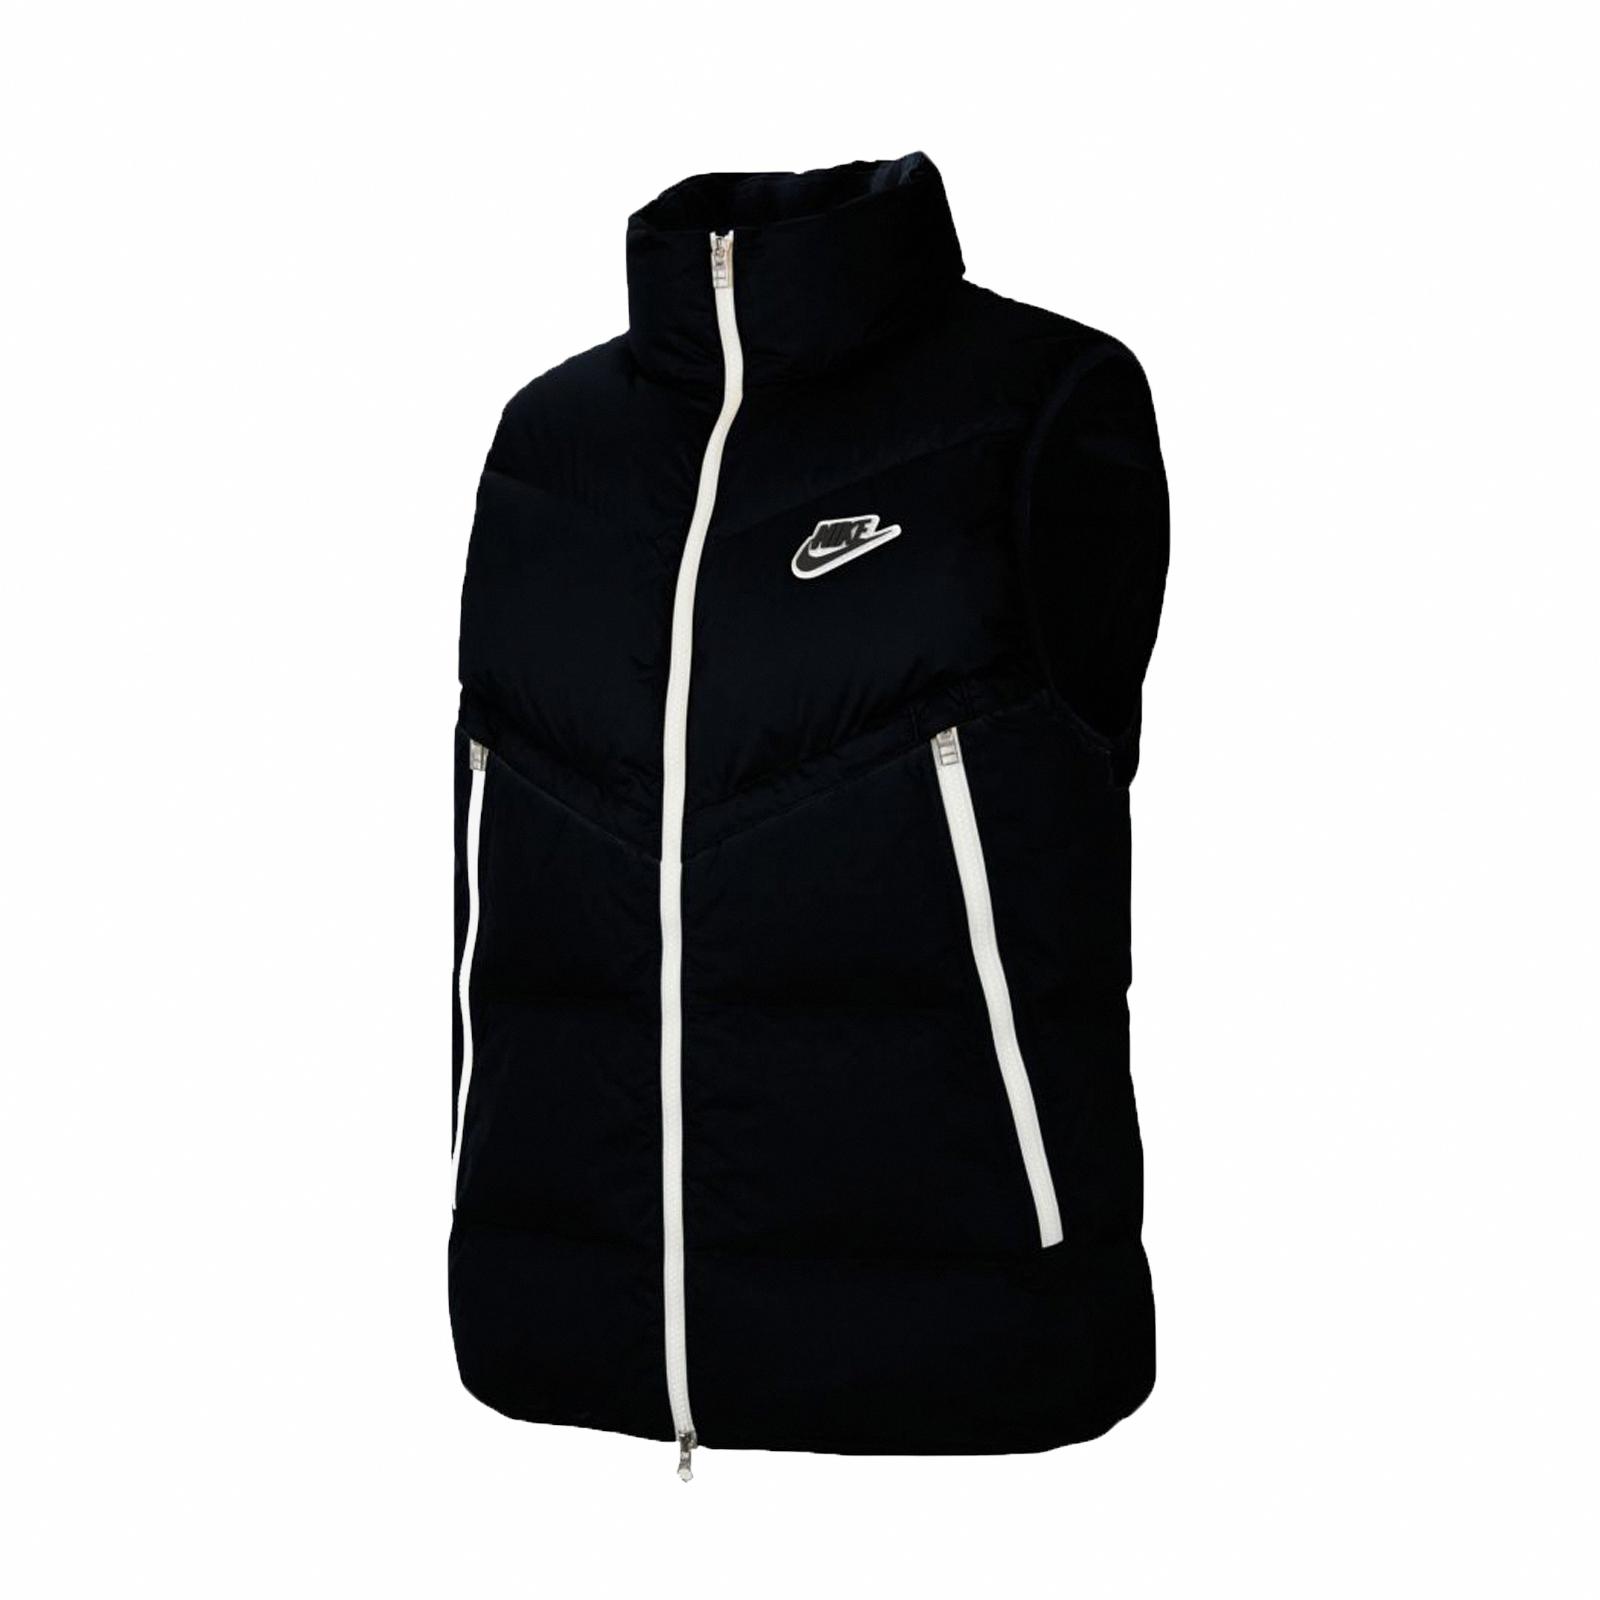 Nike 背心 NSW Windrunner Gilet 黑 男款 羽絨背心 保暖【ACS】CU4415-010